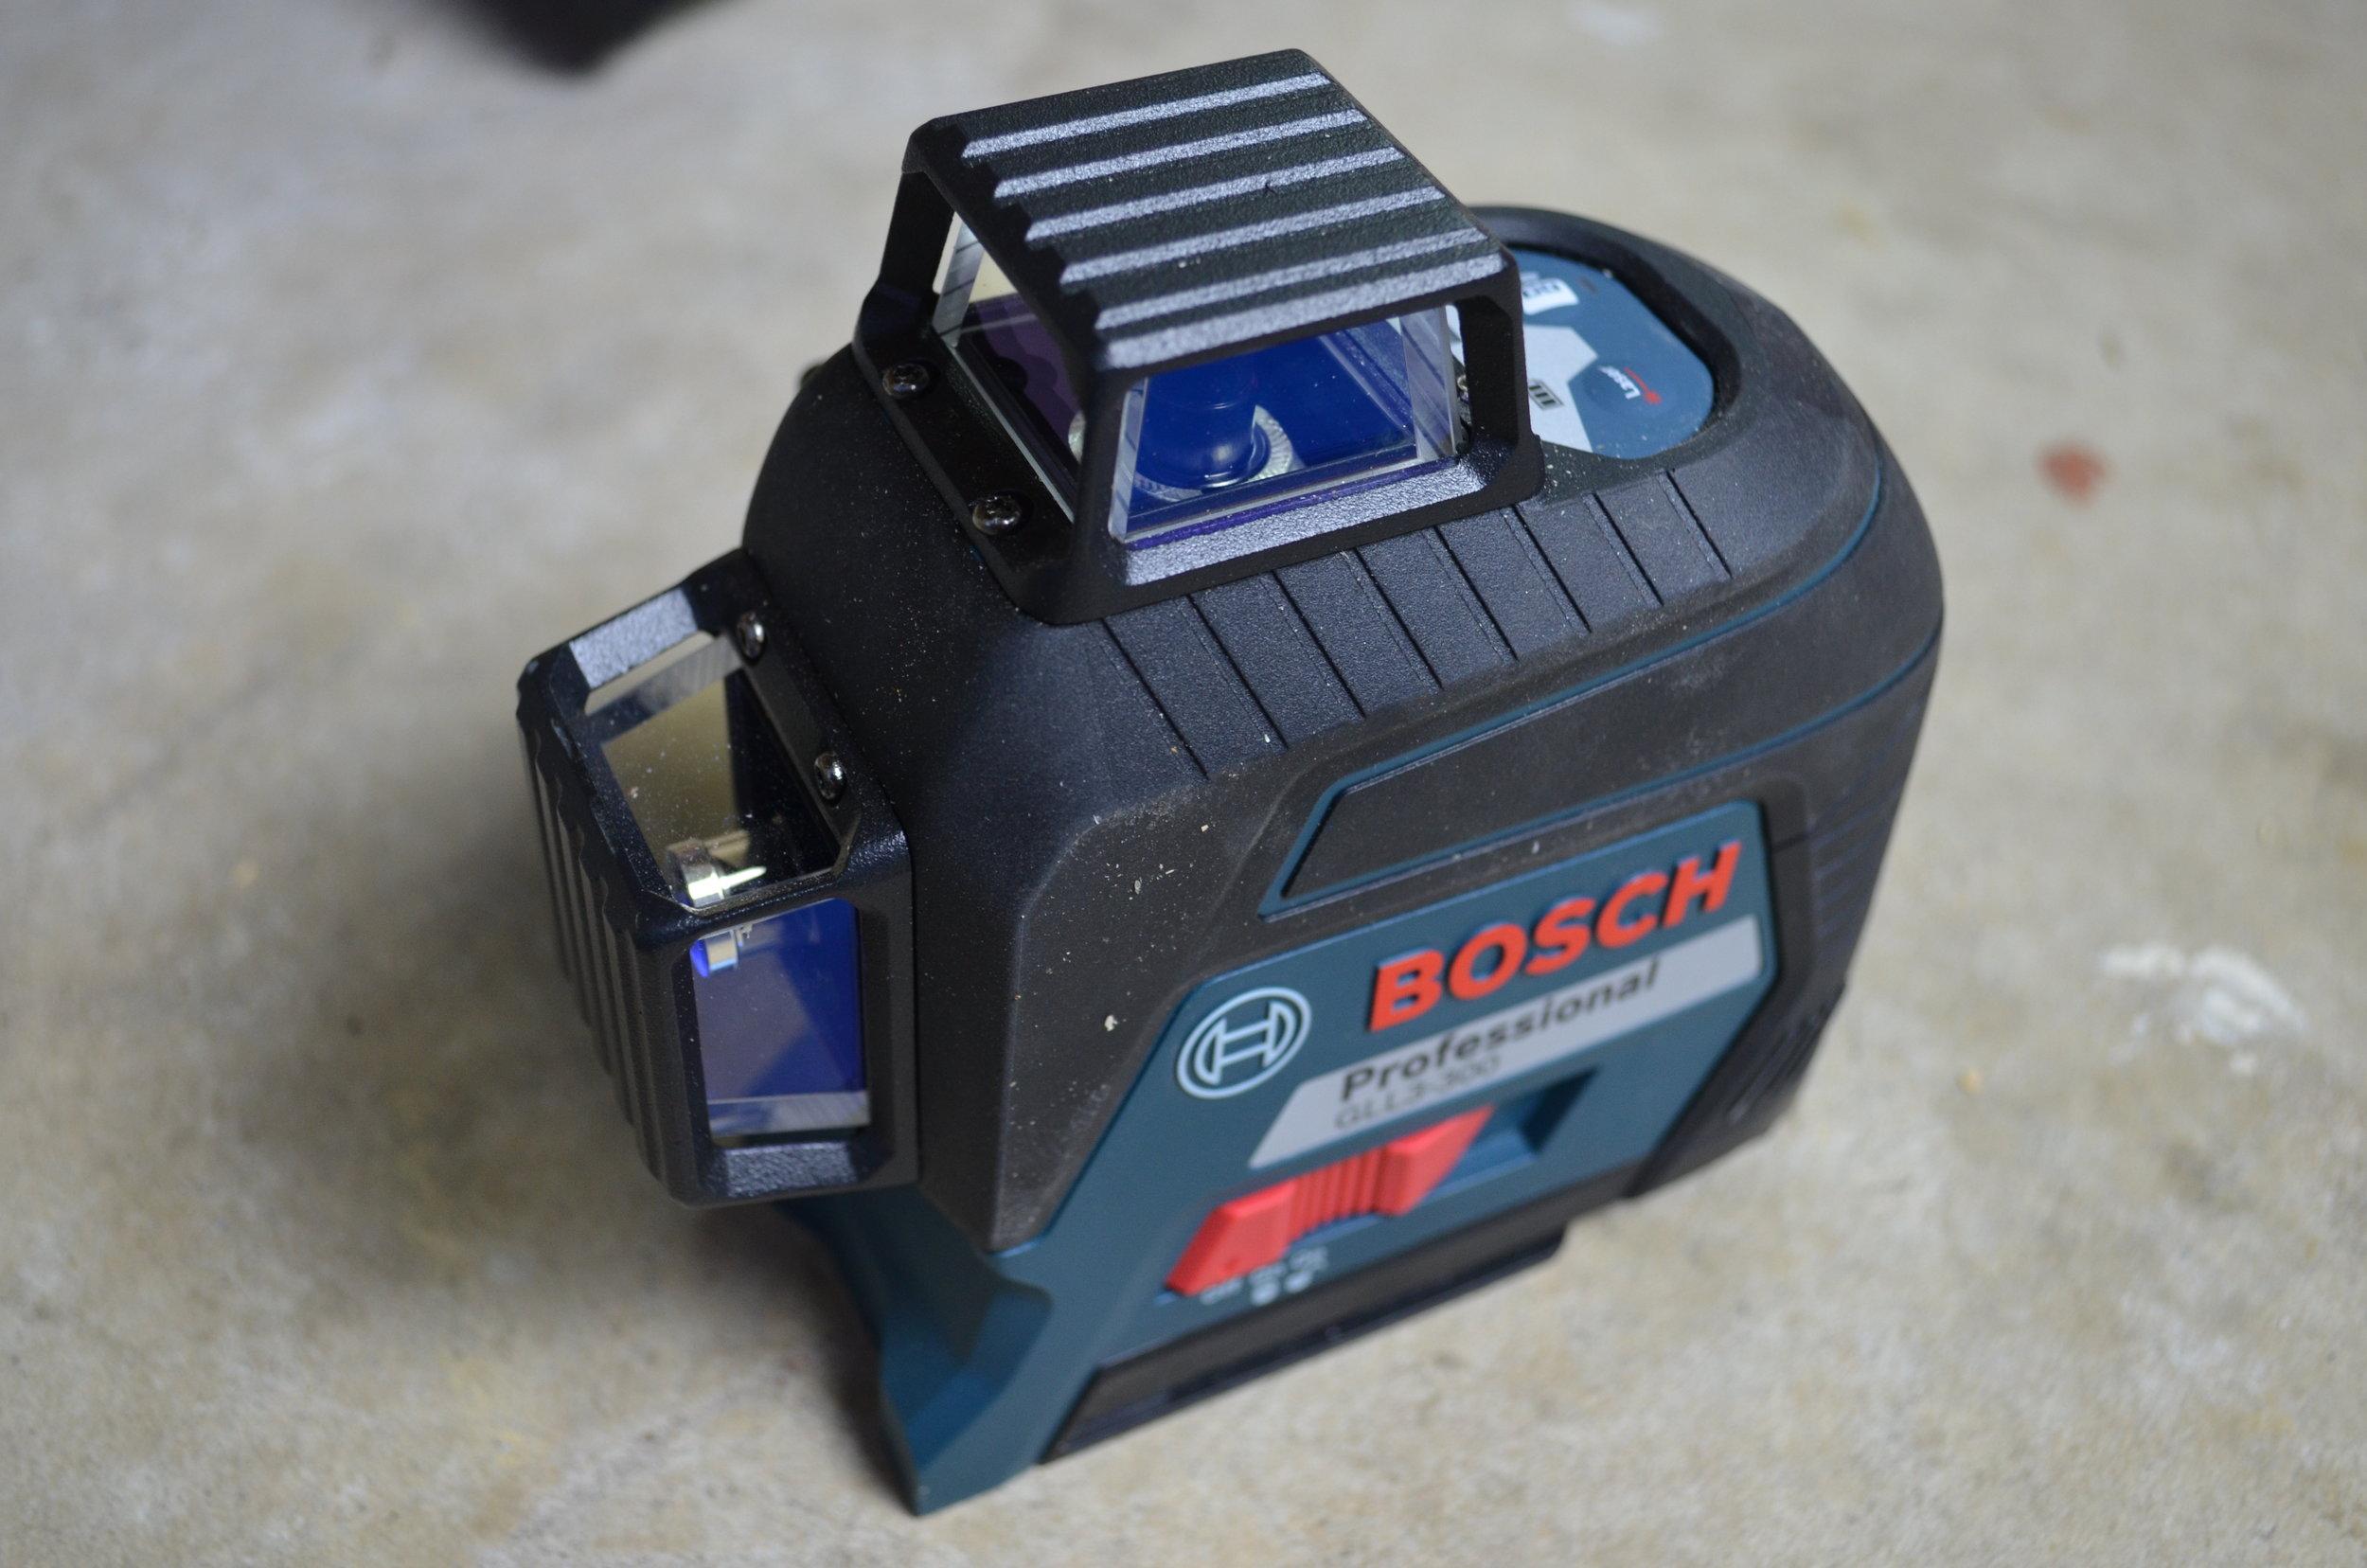 bosch-360-degree-crossline-laser